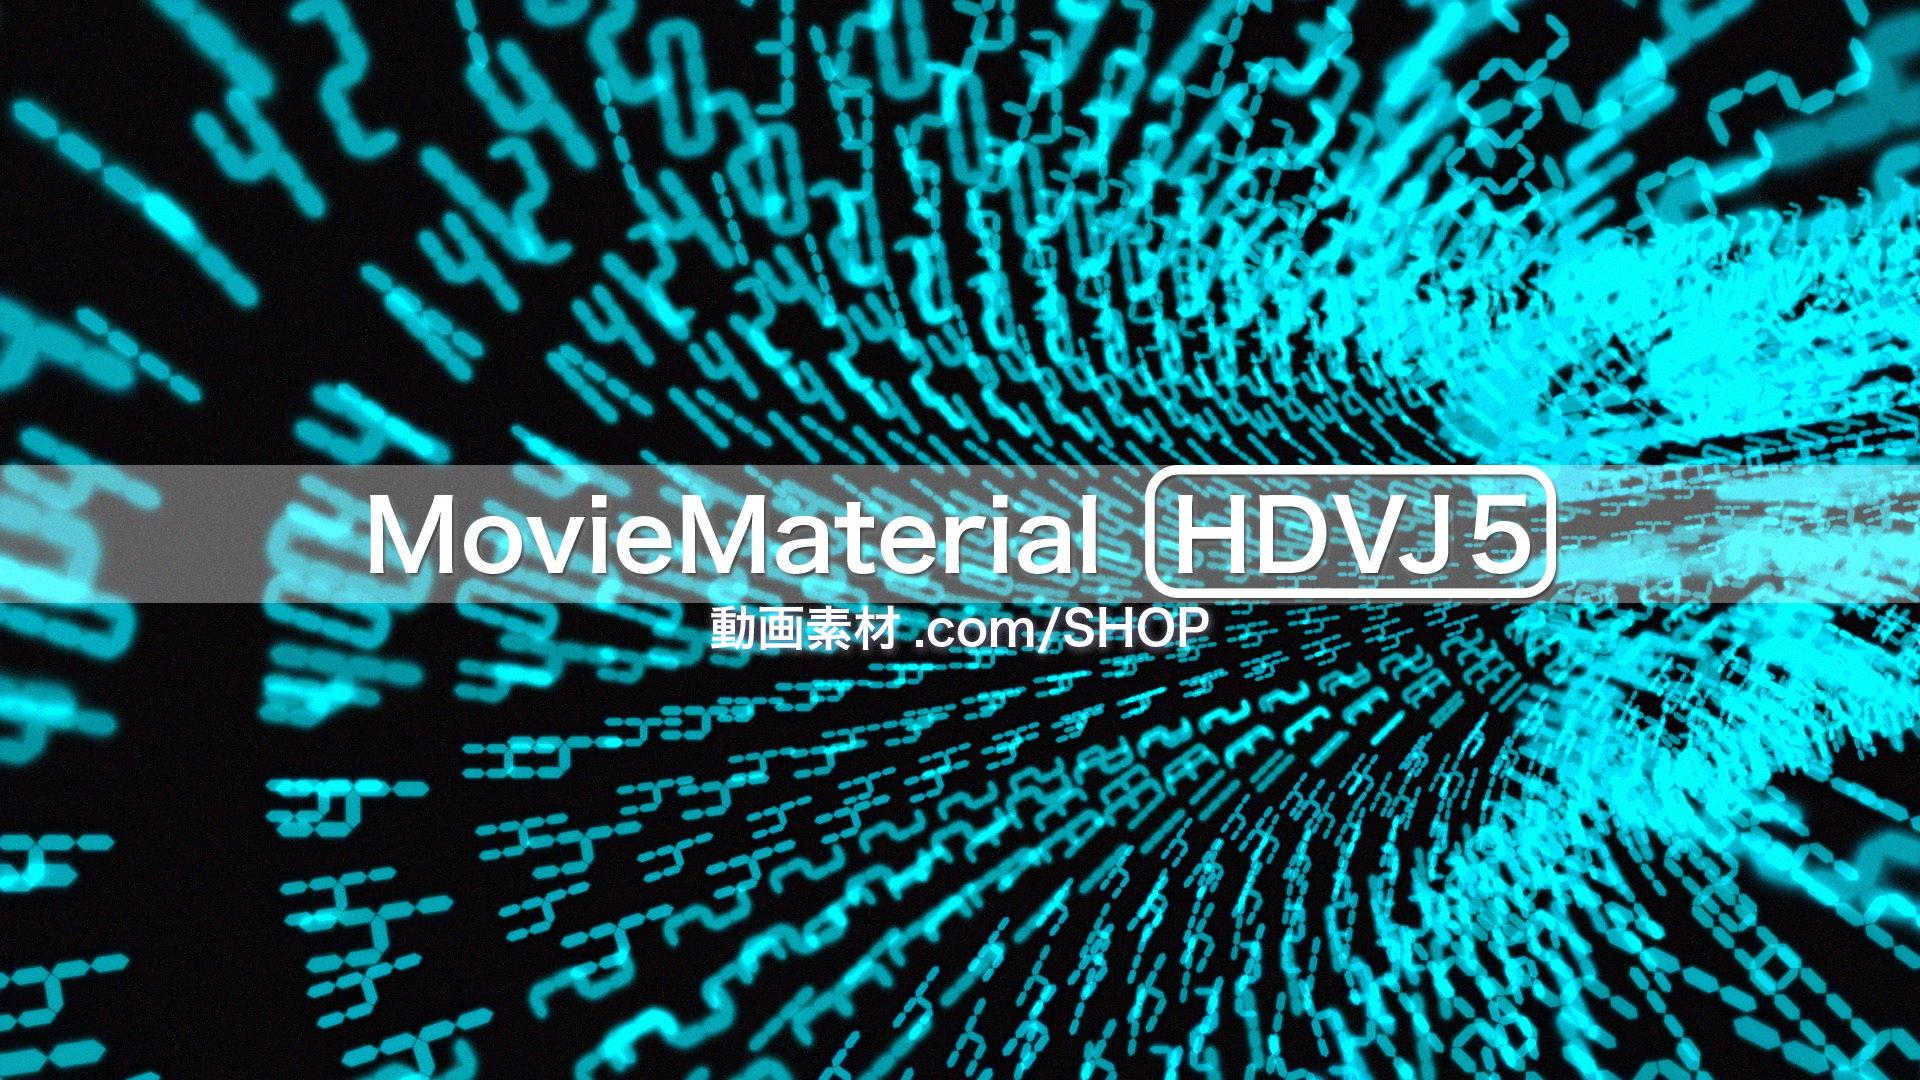 MovieMaterial HDVJ5 フルハイビジョンVJ動画素材集 画像6